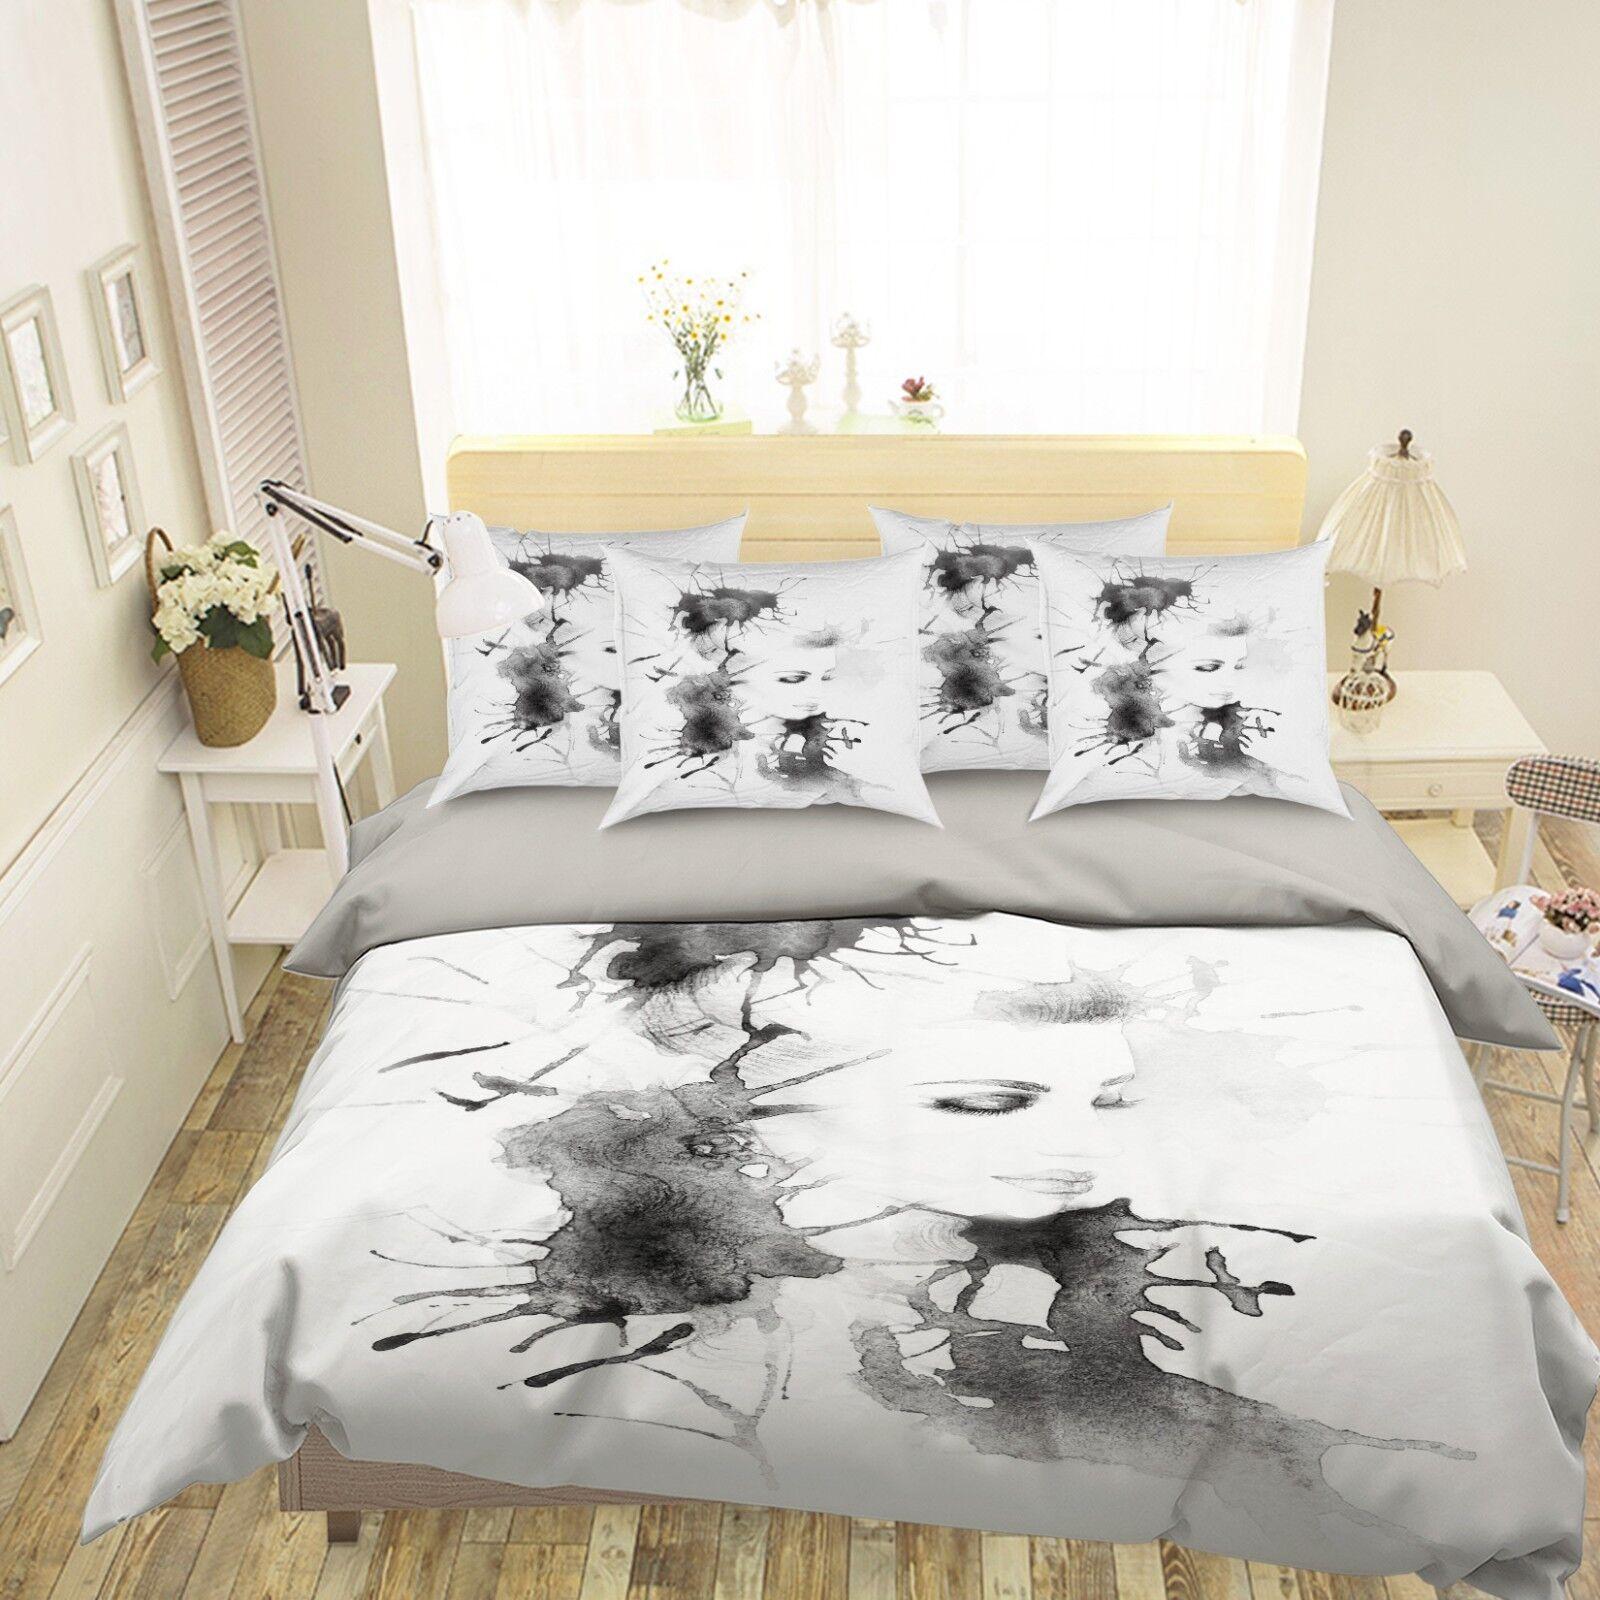 3D Ink Beauty 4 Bed Pillowcases Quilt Duvet Cover Set Single Queen King AU Cobb